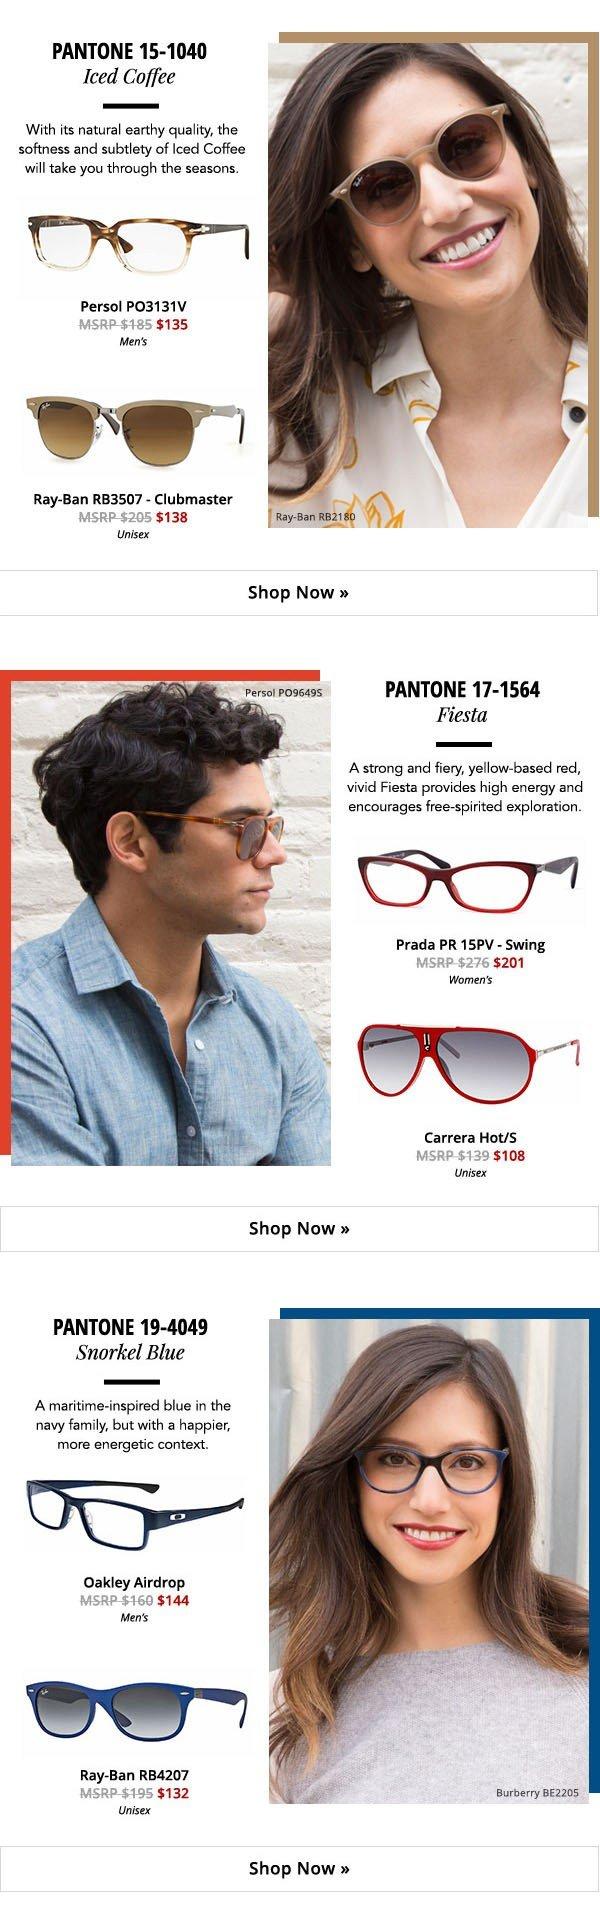 spring pantone 2016 glasses